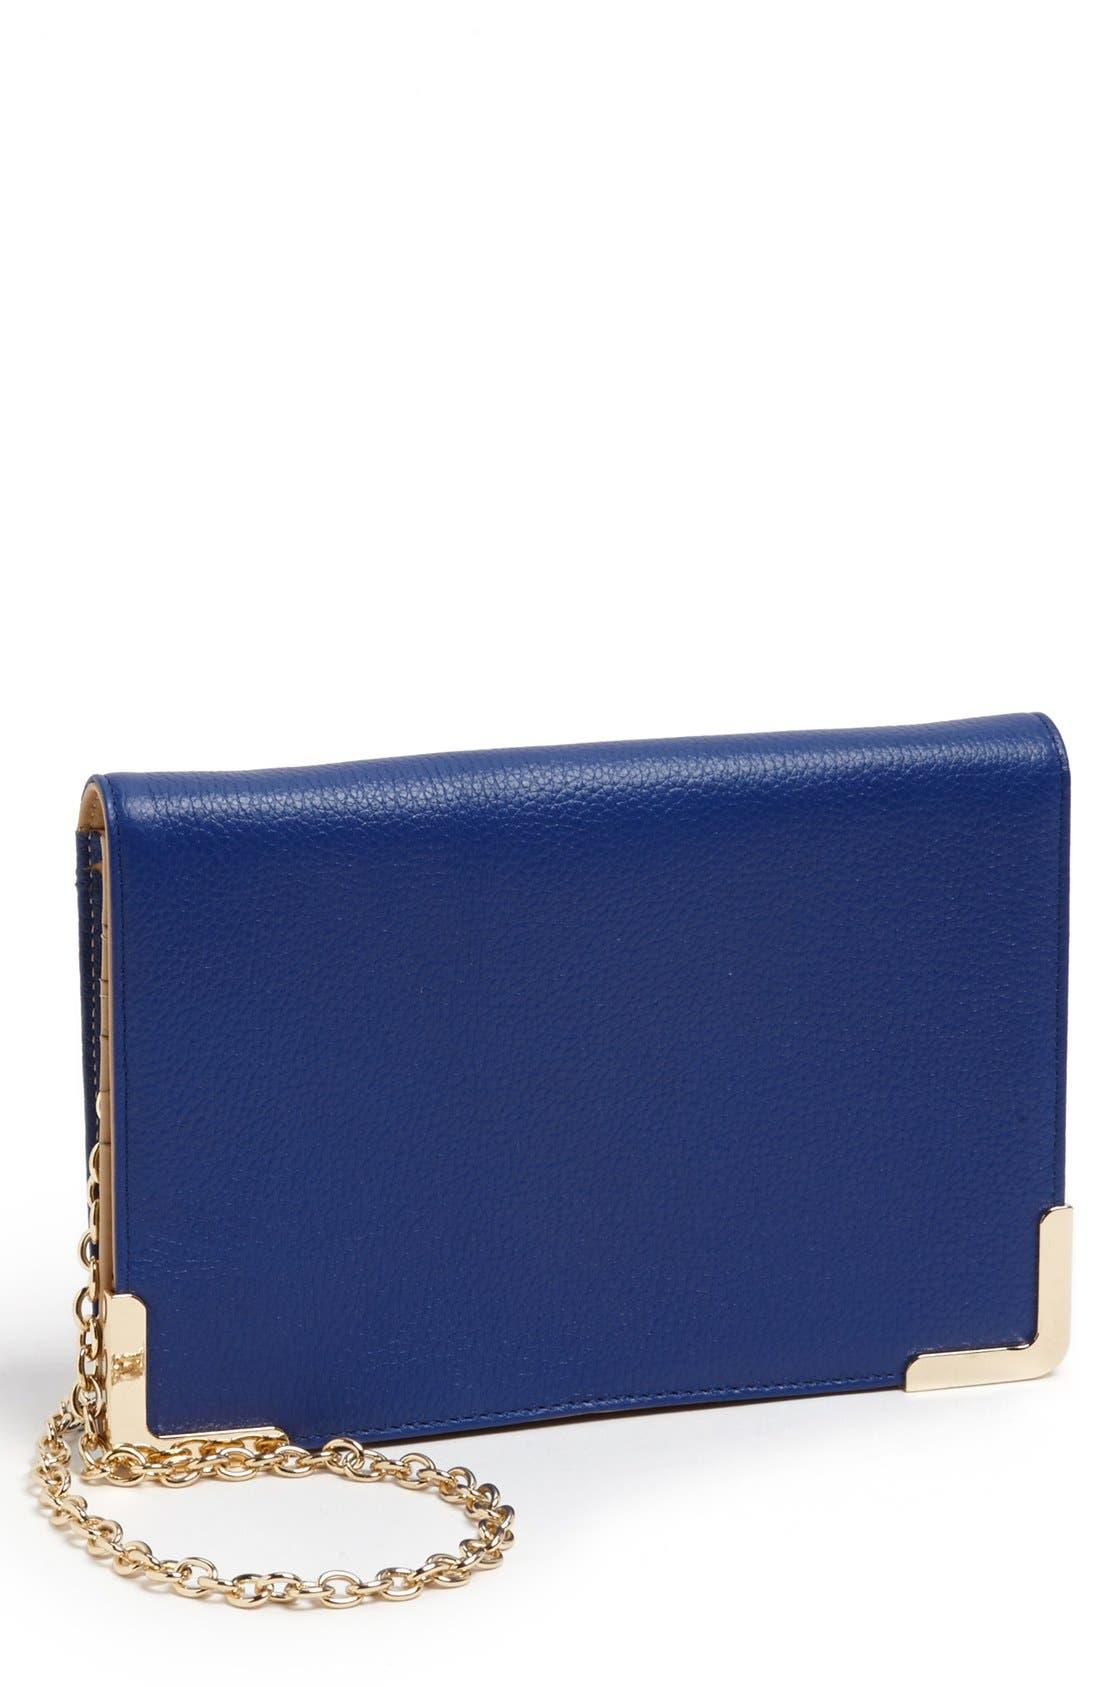 Alternate Image 1 Selected - Trouvé Leather Crossbody Bag